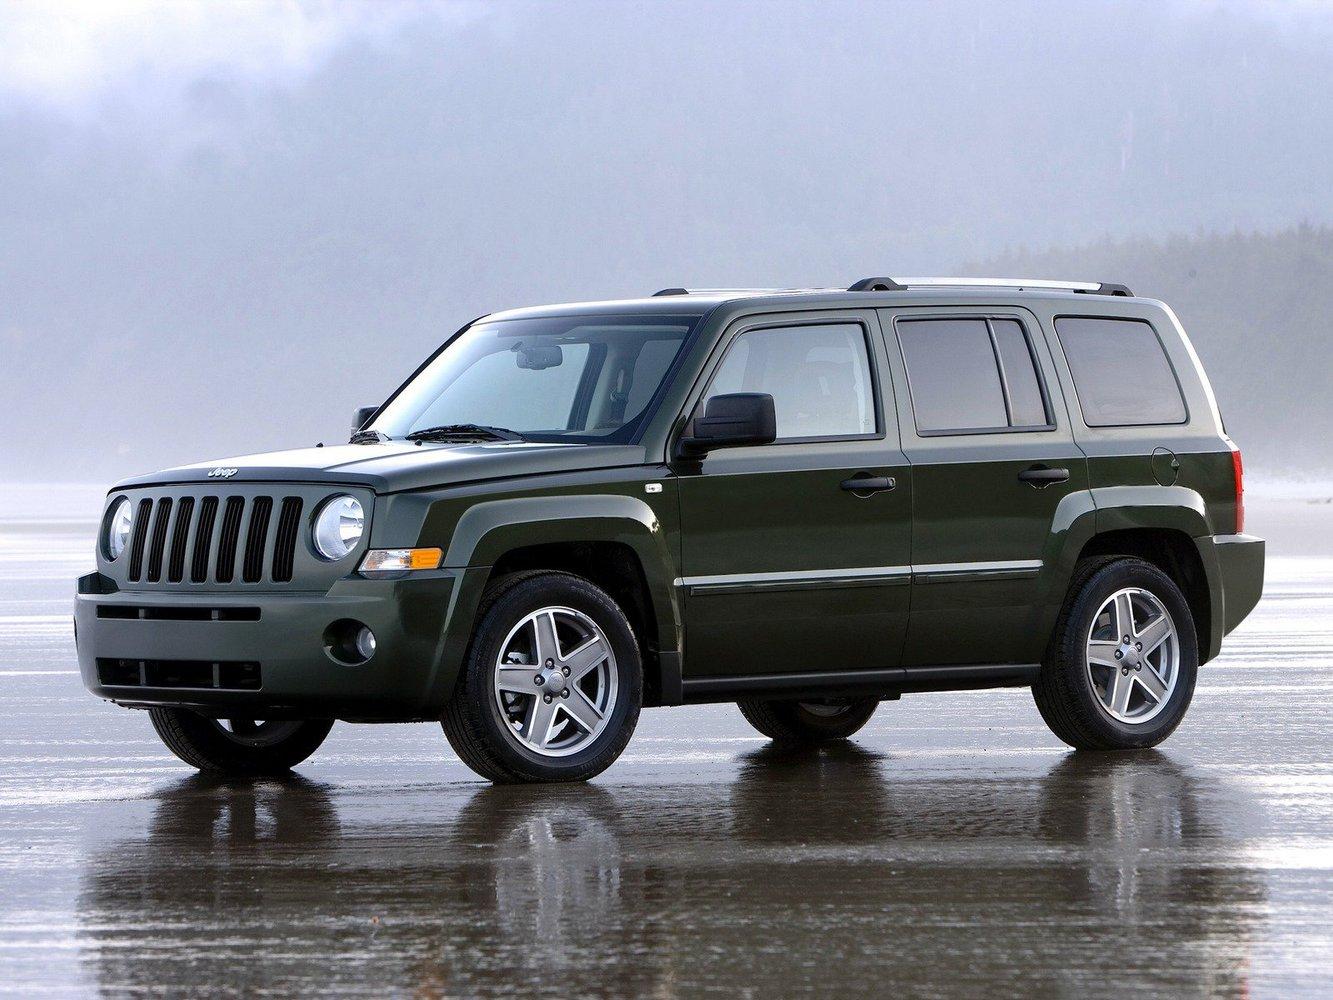 кроссовер Jeep Liberty (Patriot)